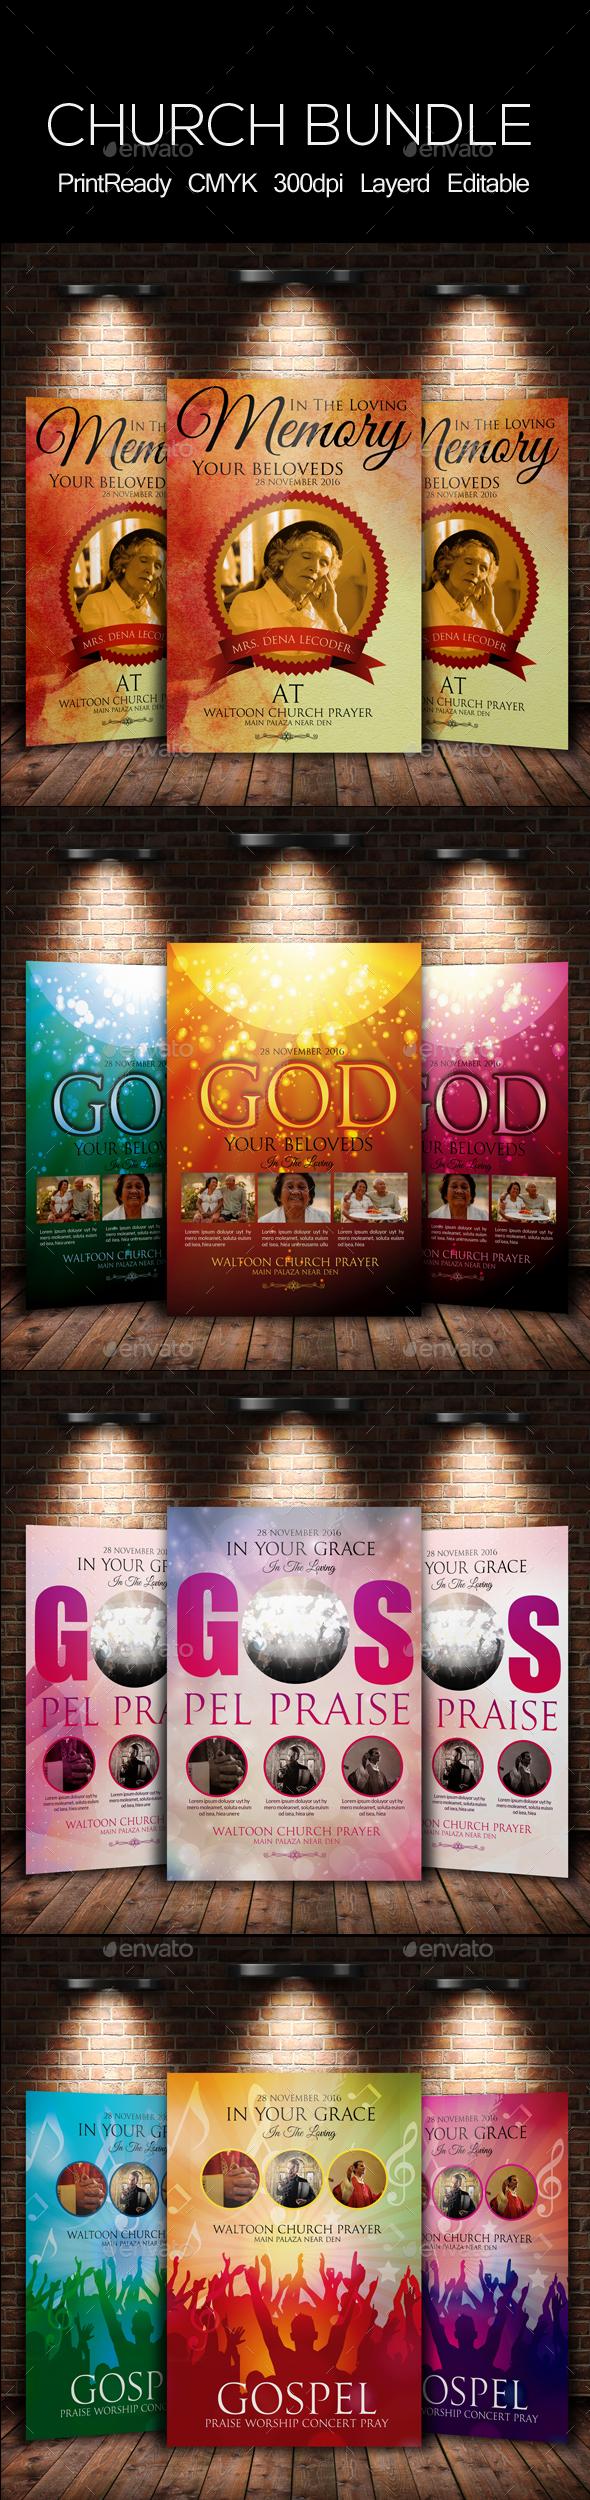 Everlasting God Church Flyer Bundle - Church Flyers